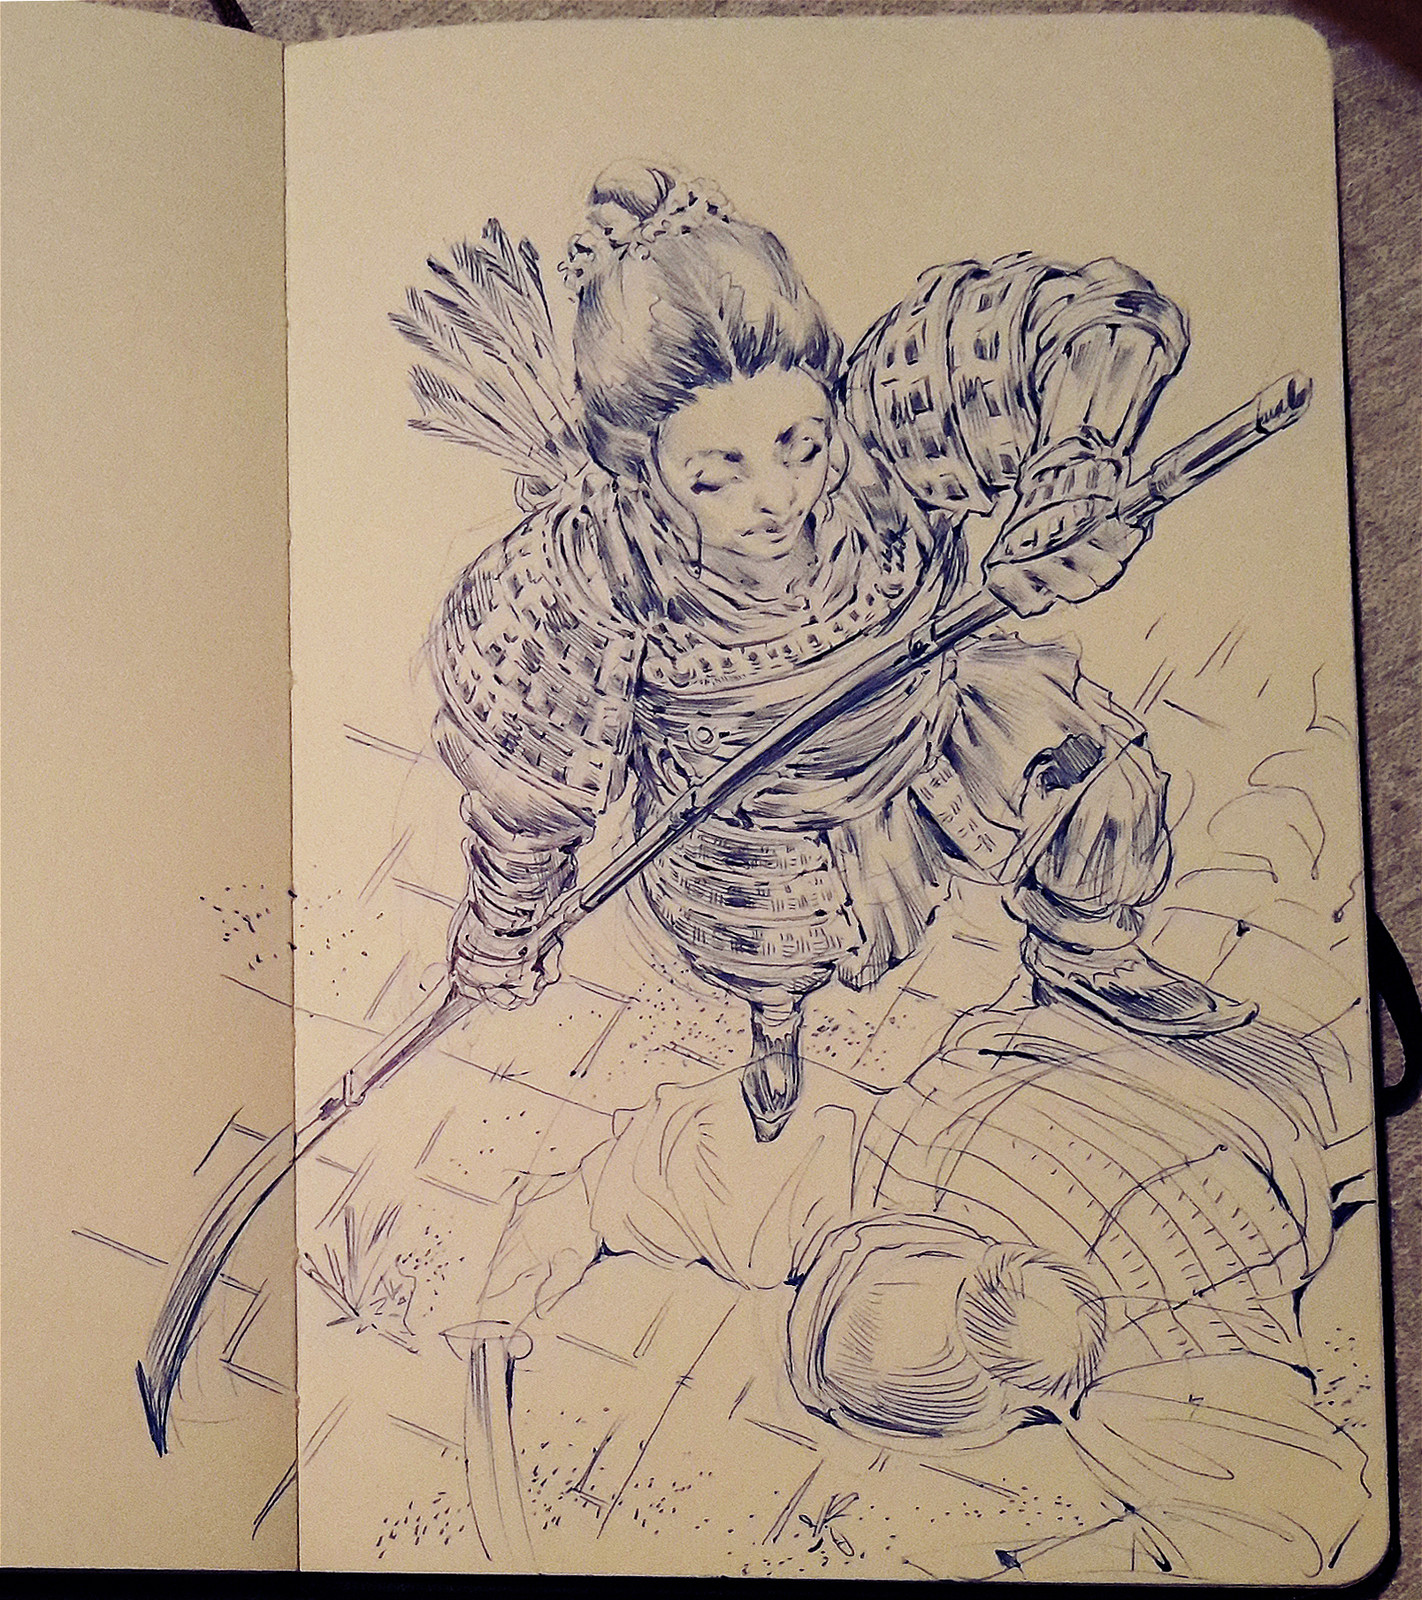 Inktober sketches 2016